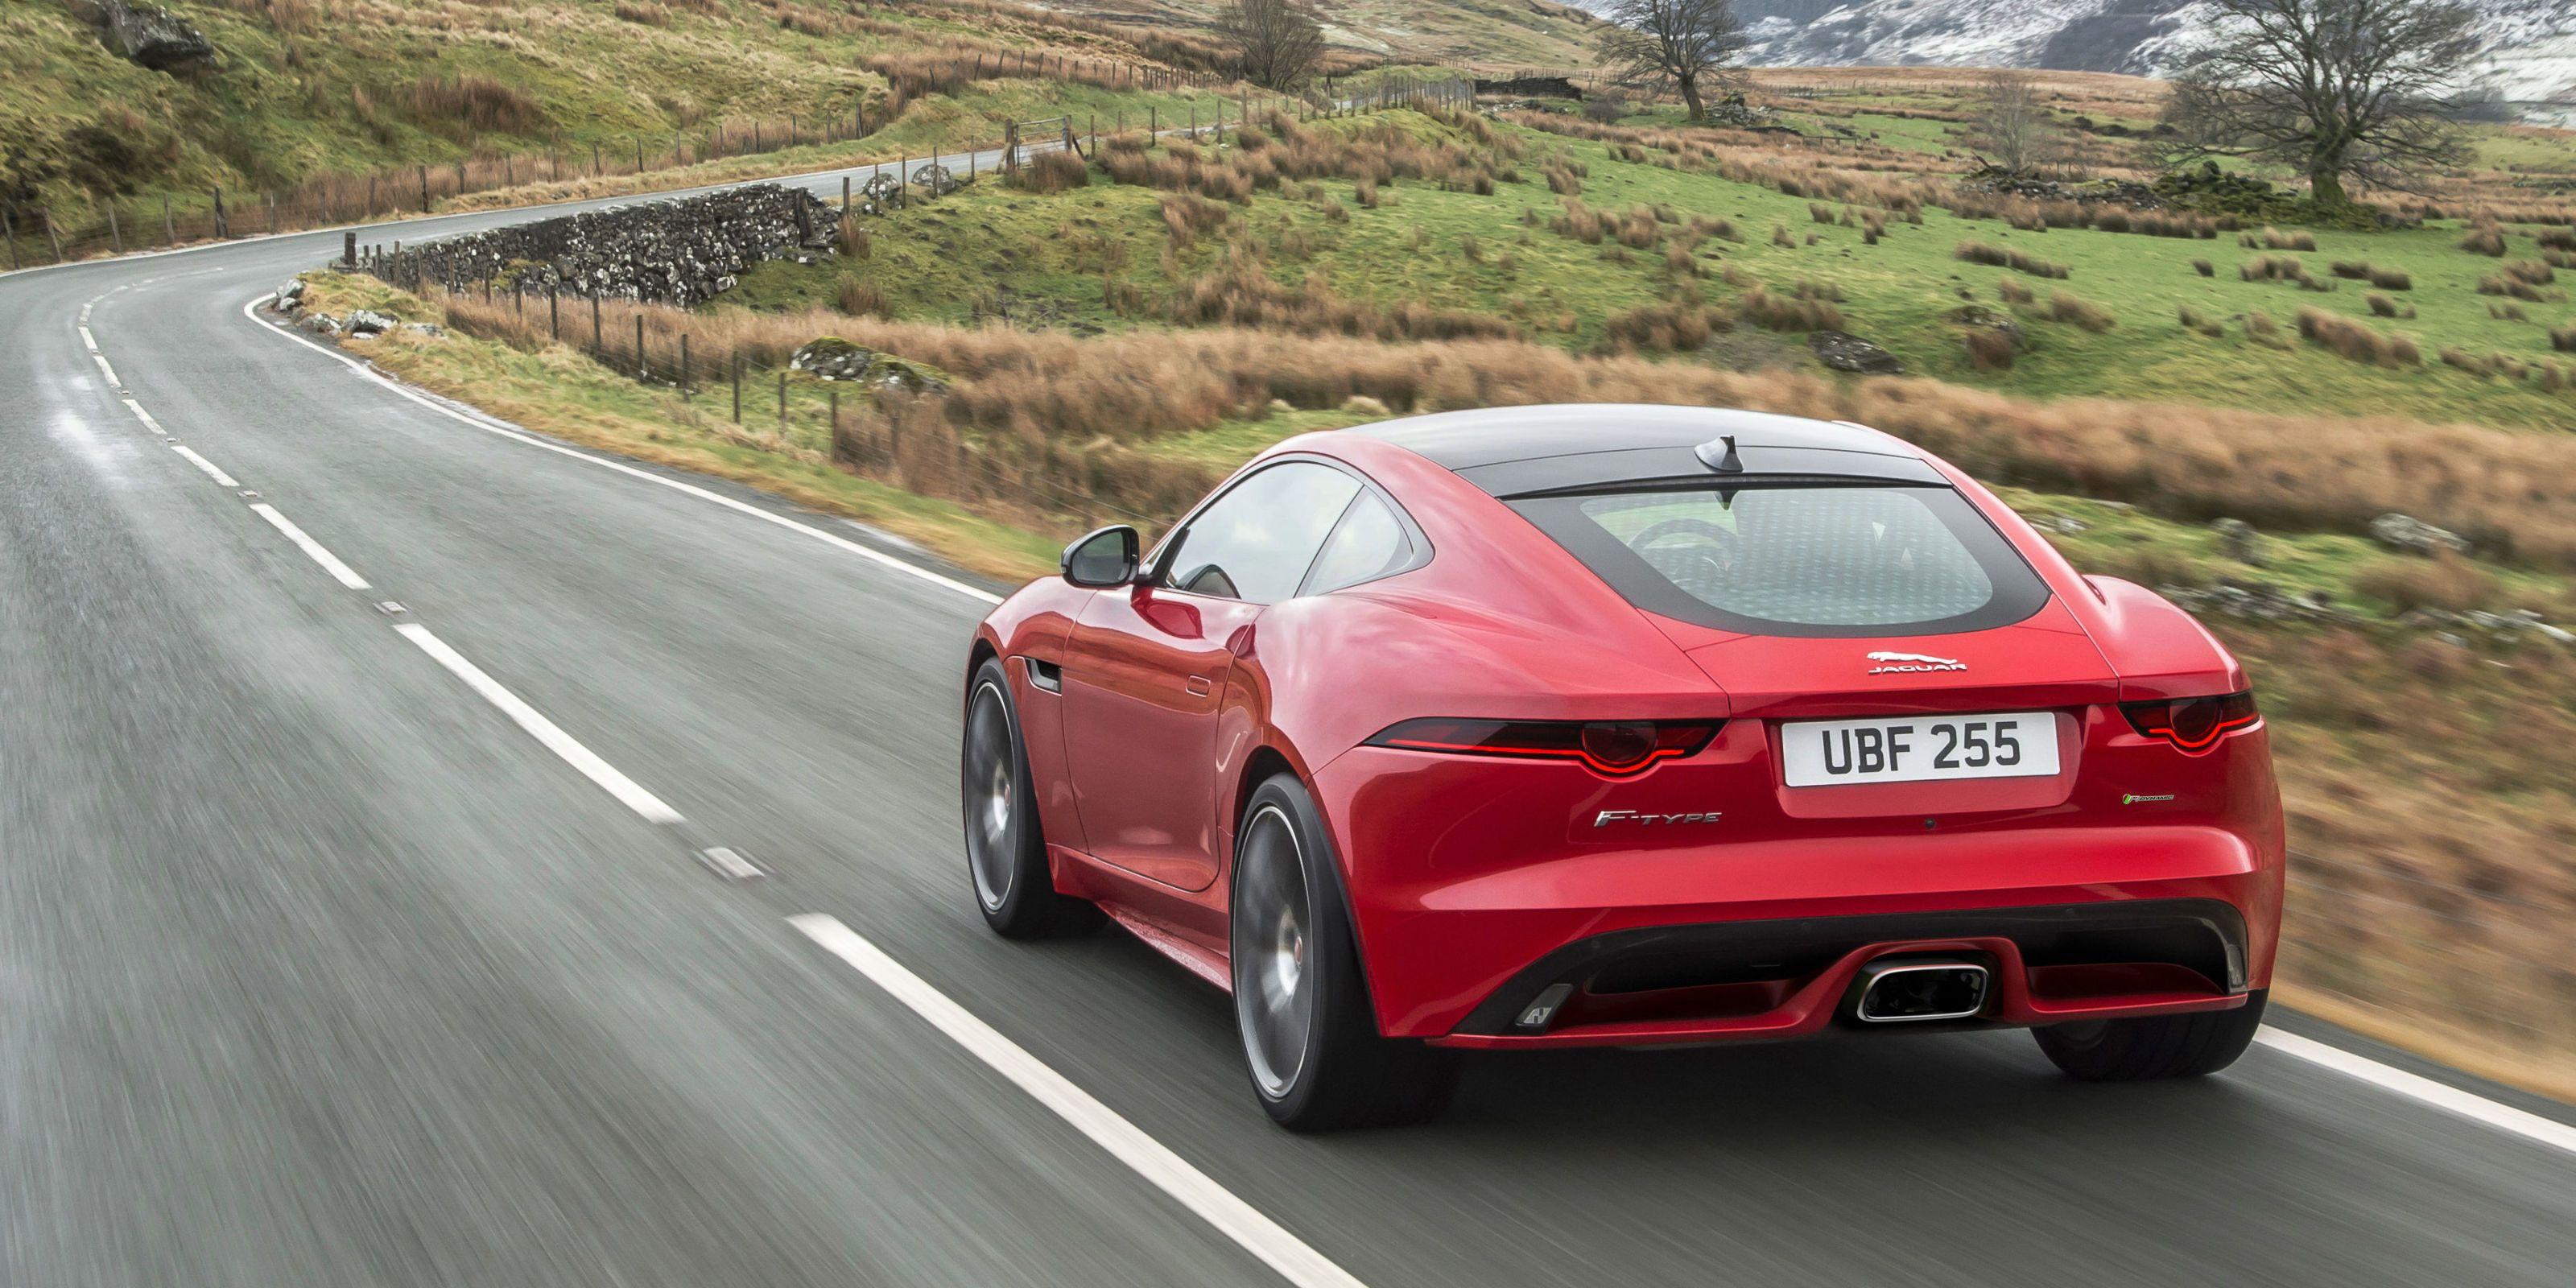 Jaguar f type exhaust sound